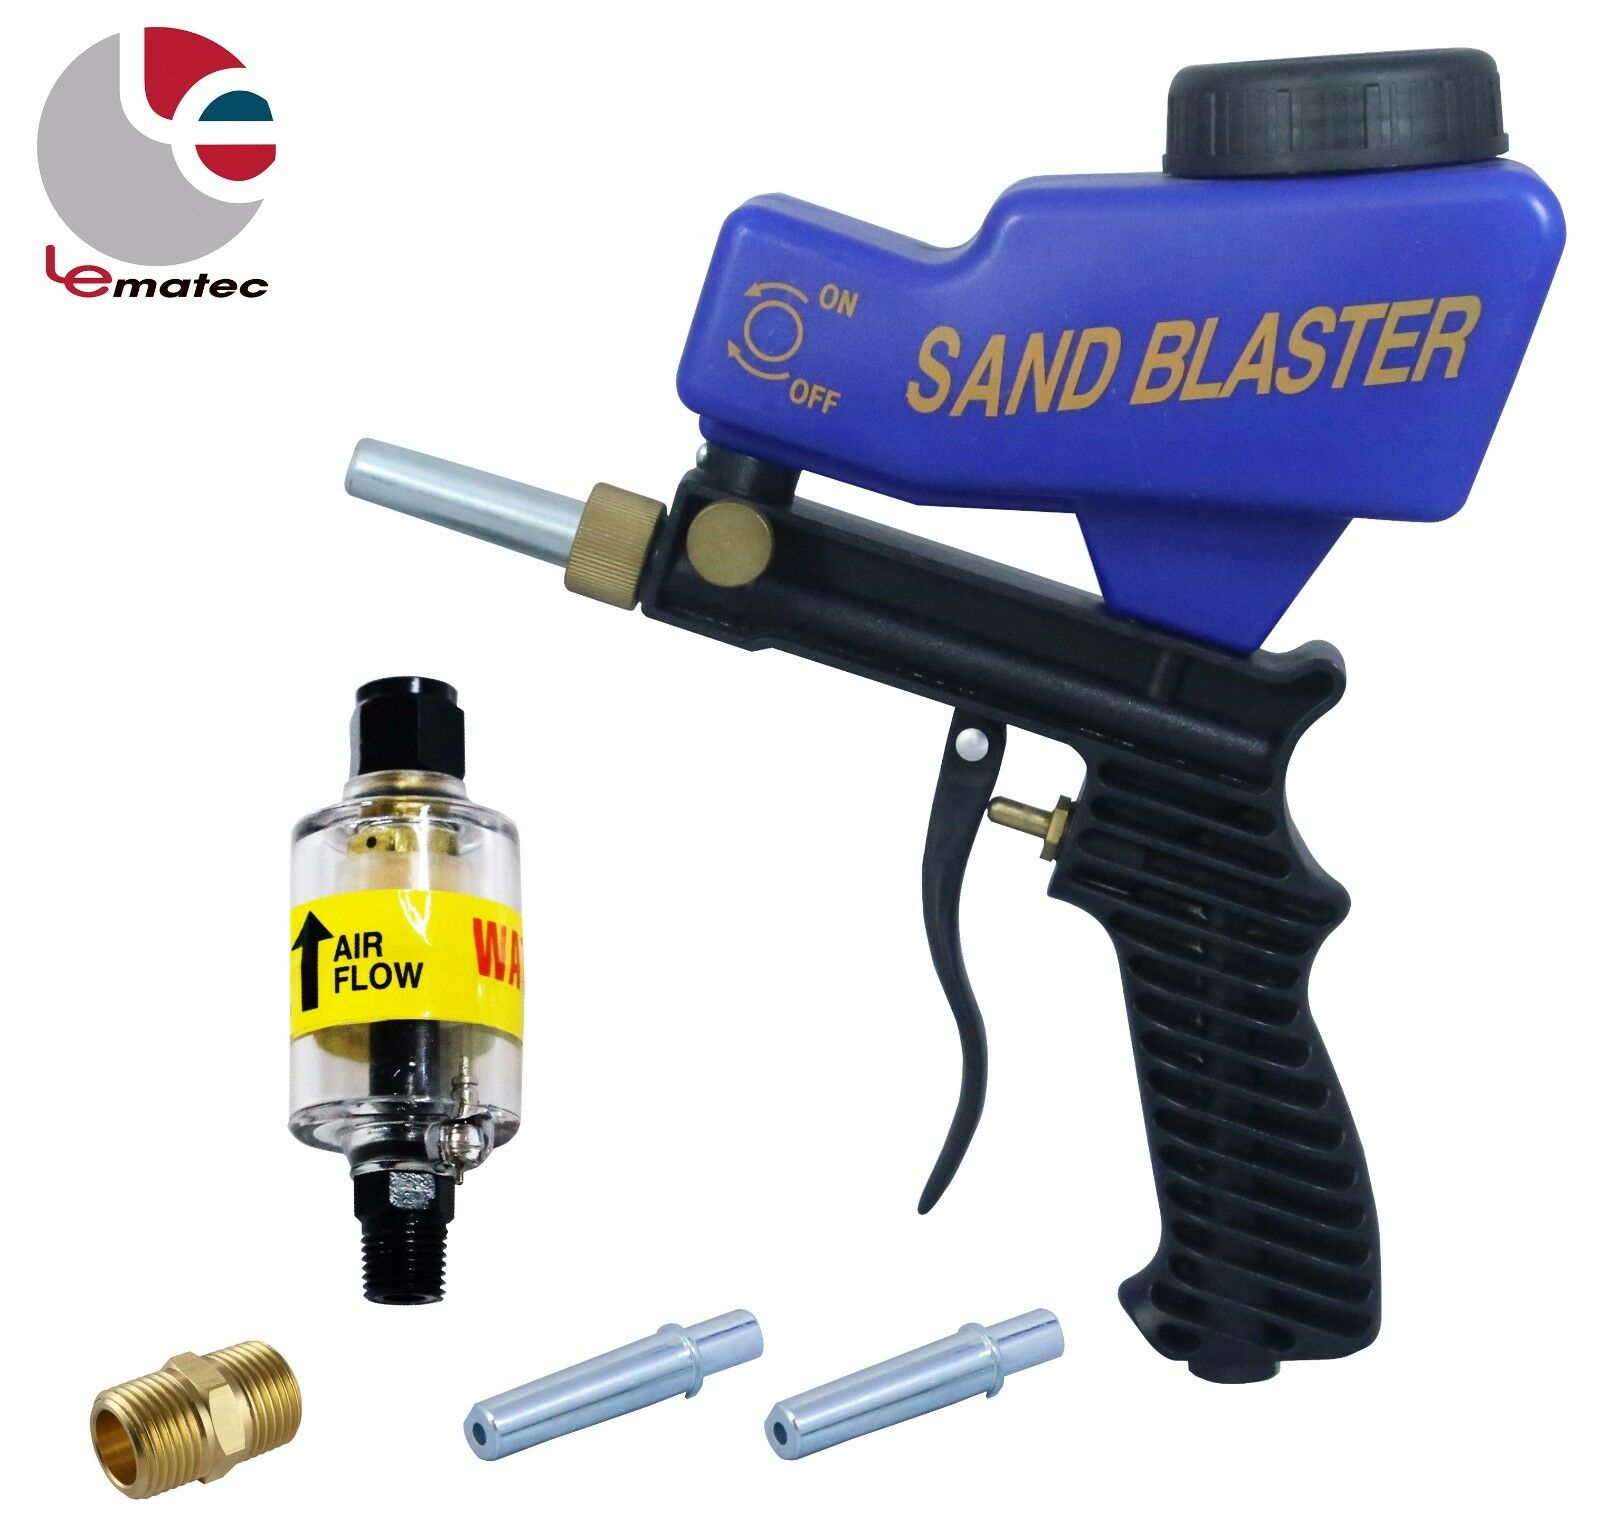 LEMATEC Sandblaster Gun With 1 4  Air Filter Water Brass Fitting Blasting kits